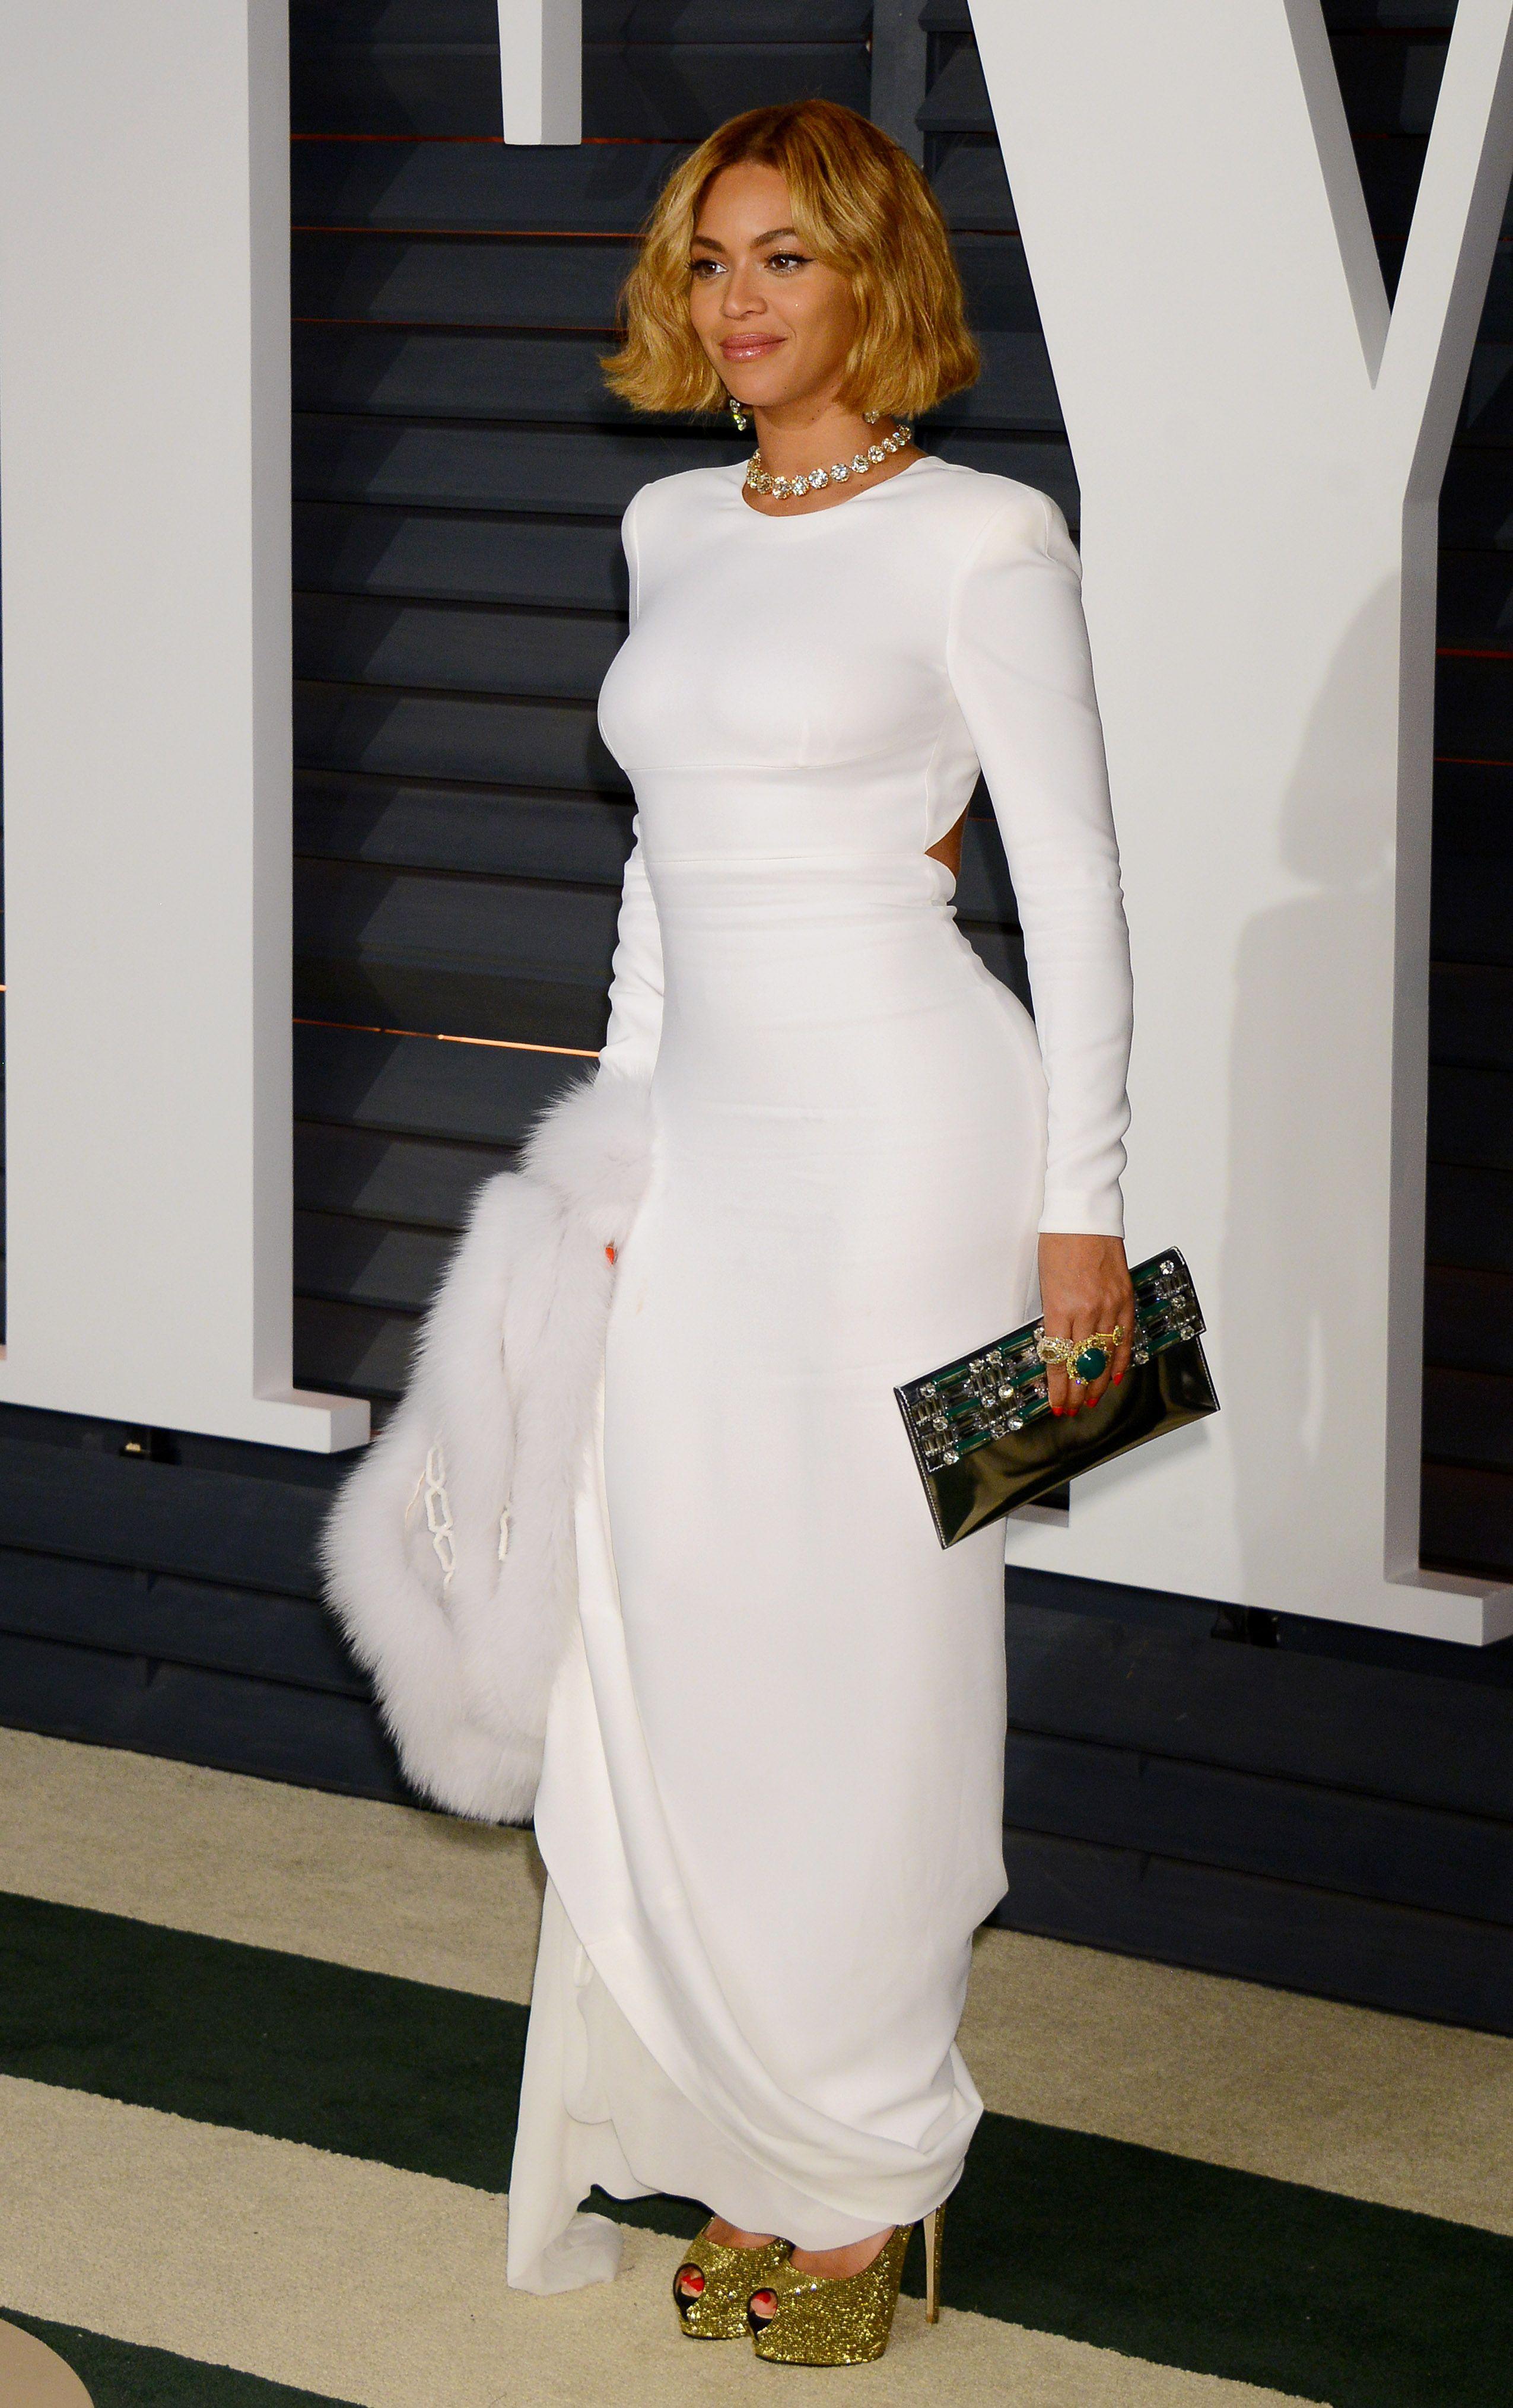 Beyonce Knowles Photo 2993662 2550x4058 Besteyecandy Com Black Sheer Dress Stella Mccartney Dresses Vanity Fair Oscar Party [ 4058 x 2550 Pixel ]